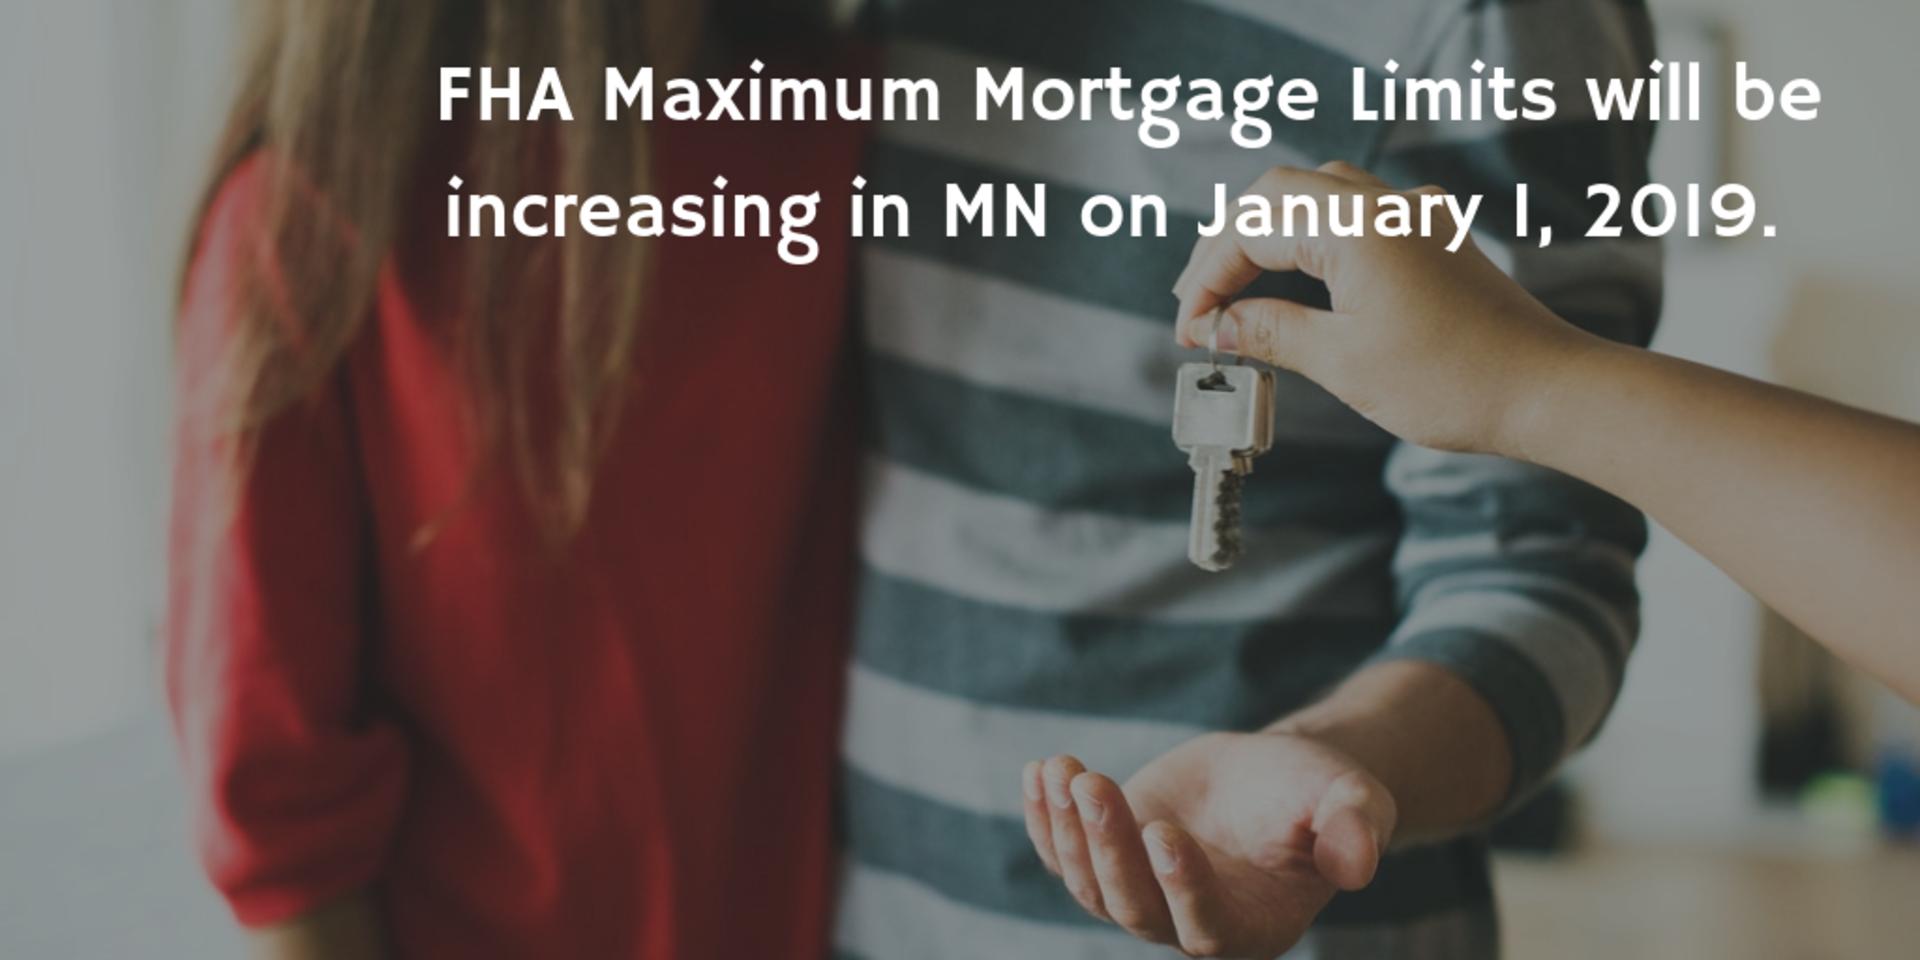 FHA Maximum Mortgage Limits